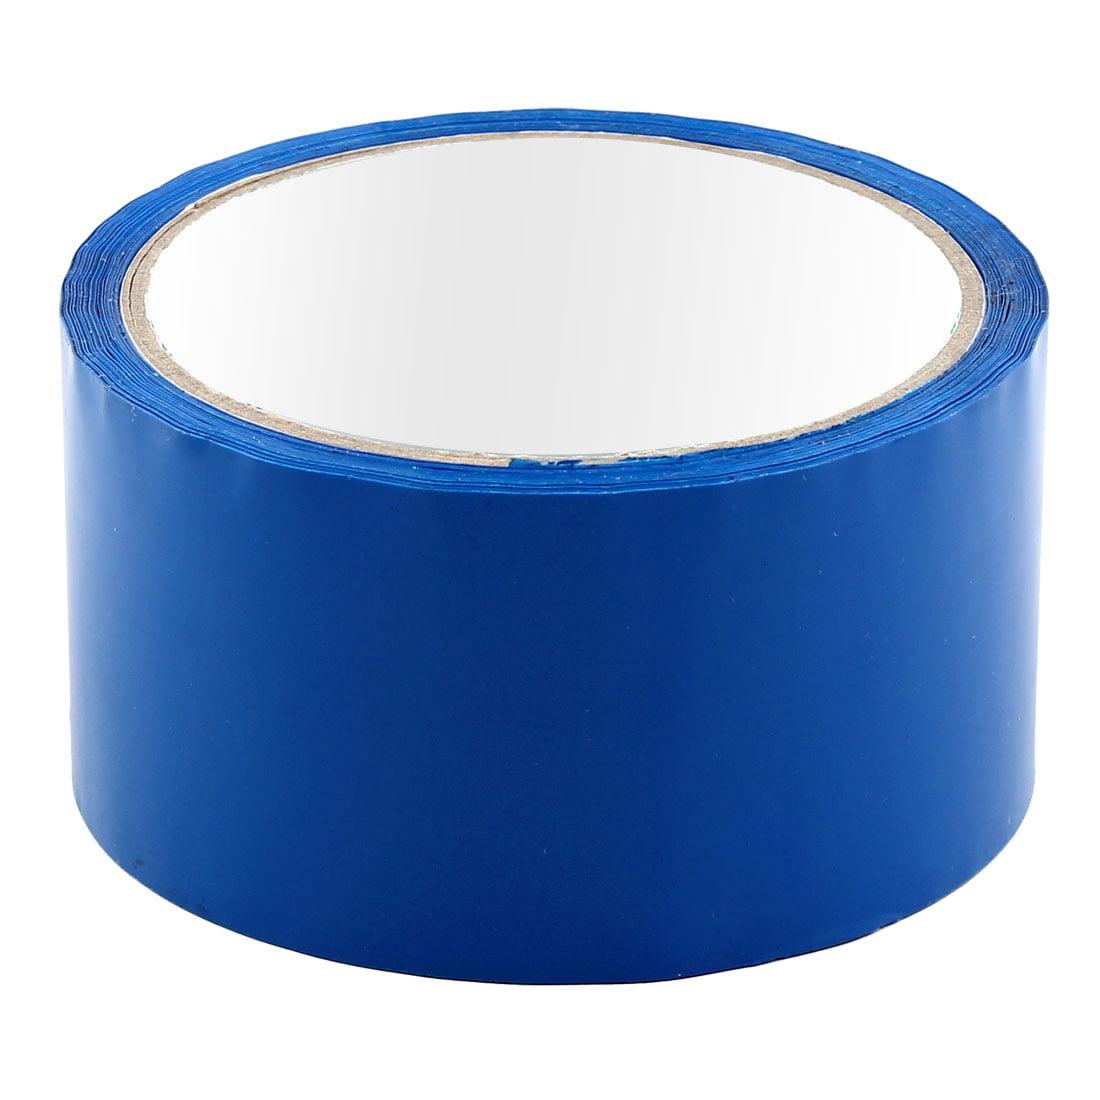 Shipping PVC Box Sealing Adhesive Tape Dark Blue 1.9'' x 32.8 Yards(295.3 Ft)